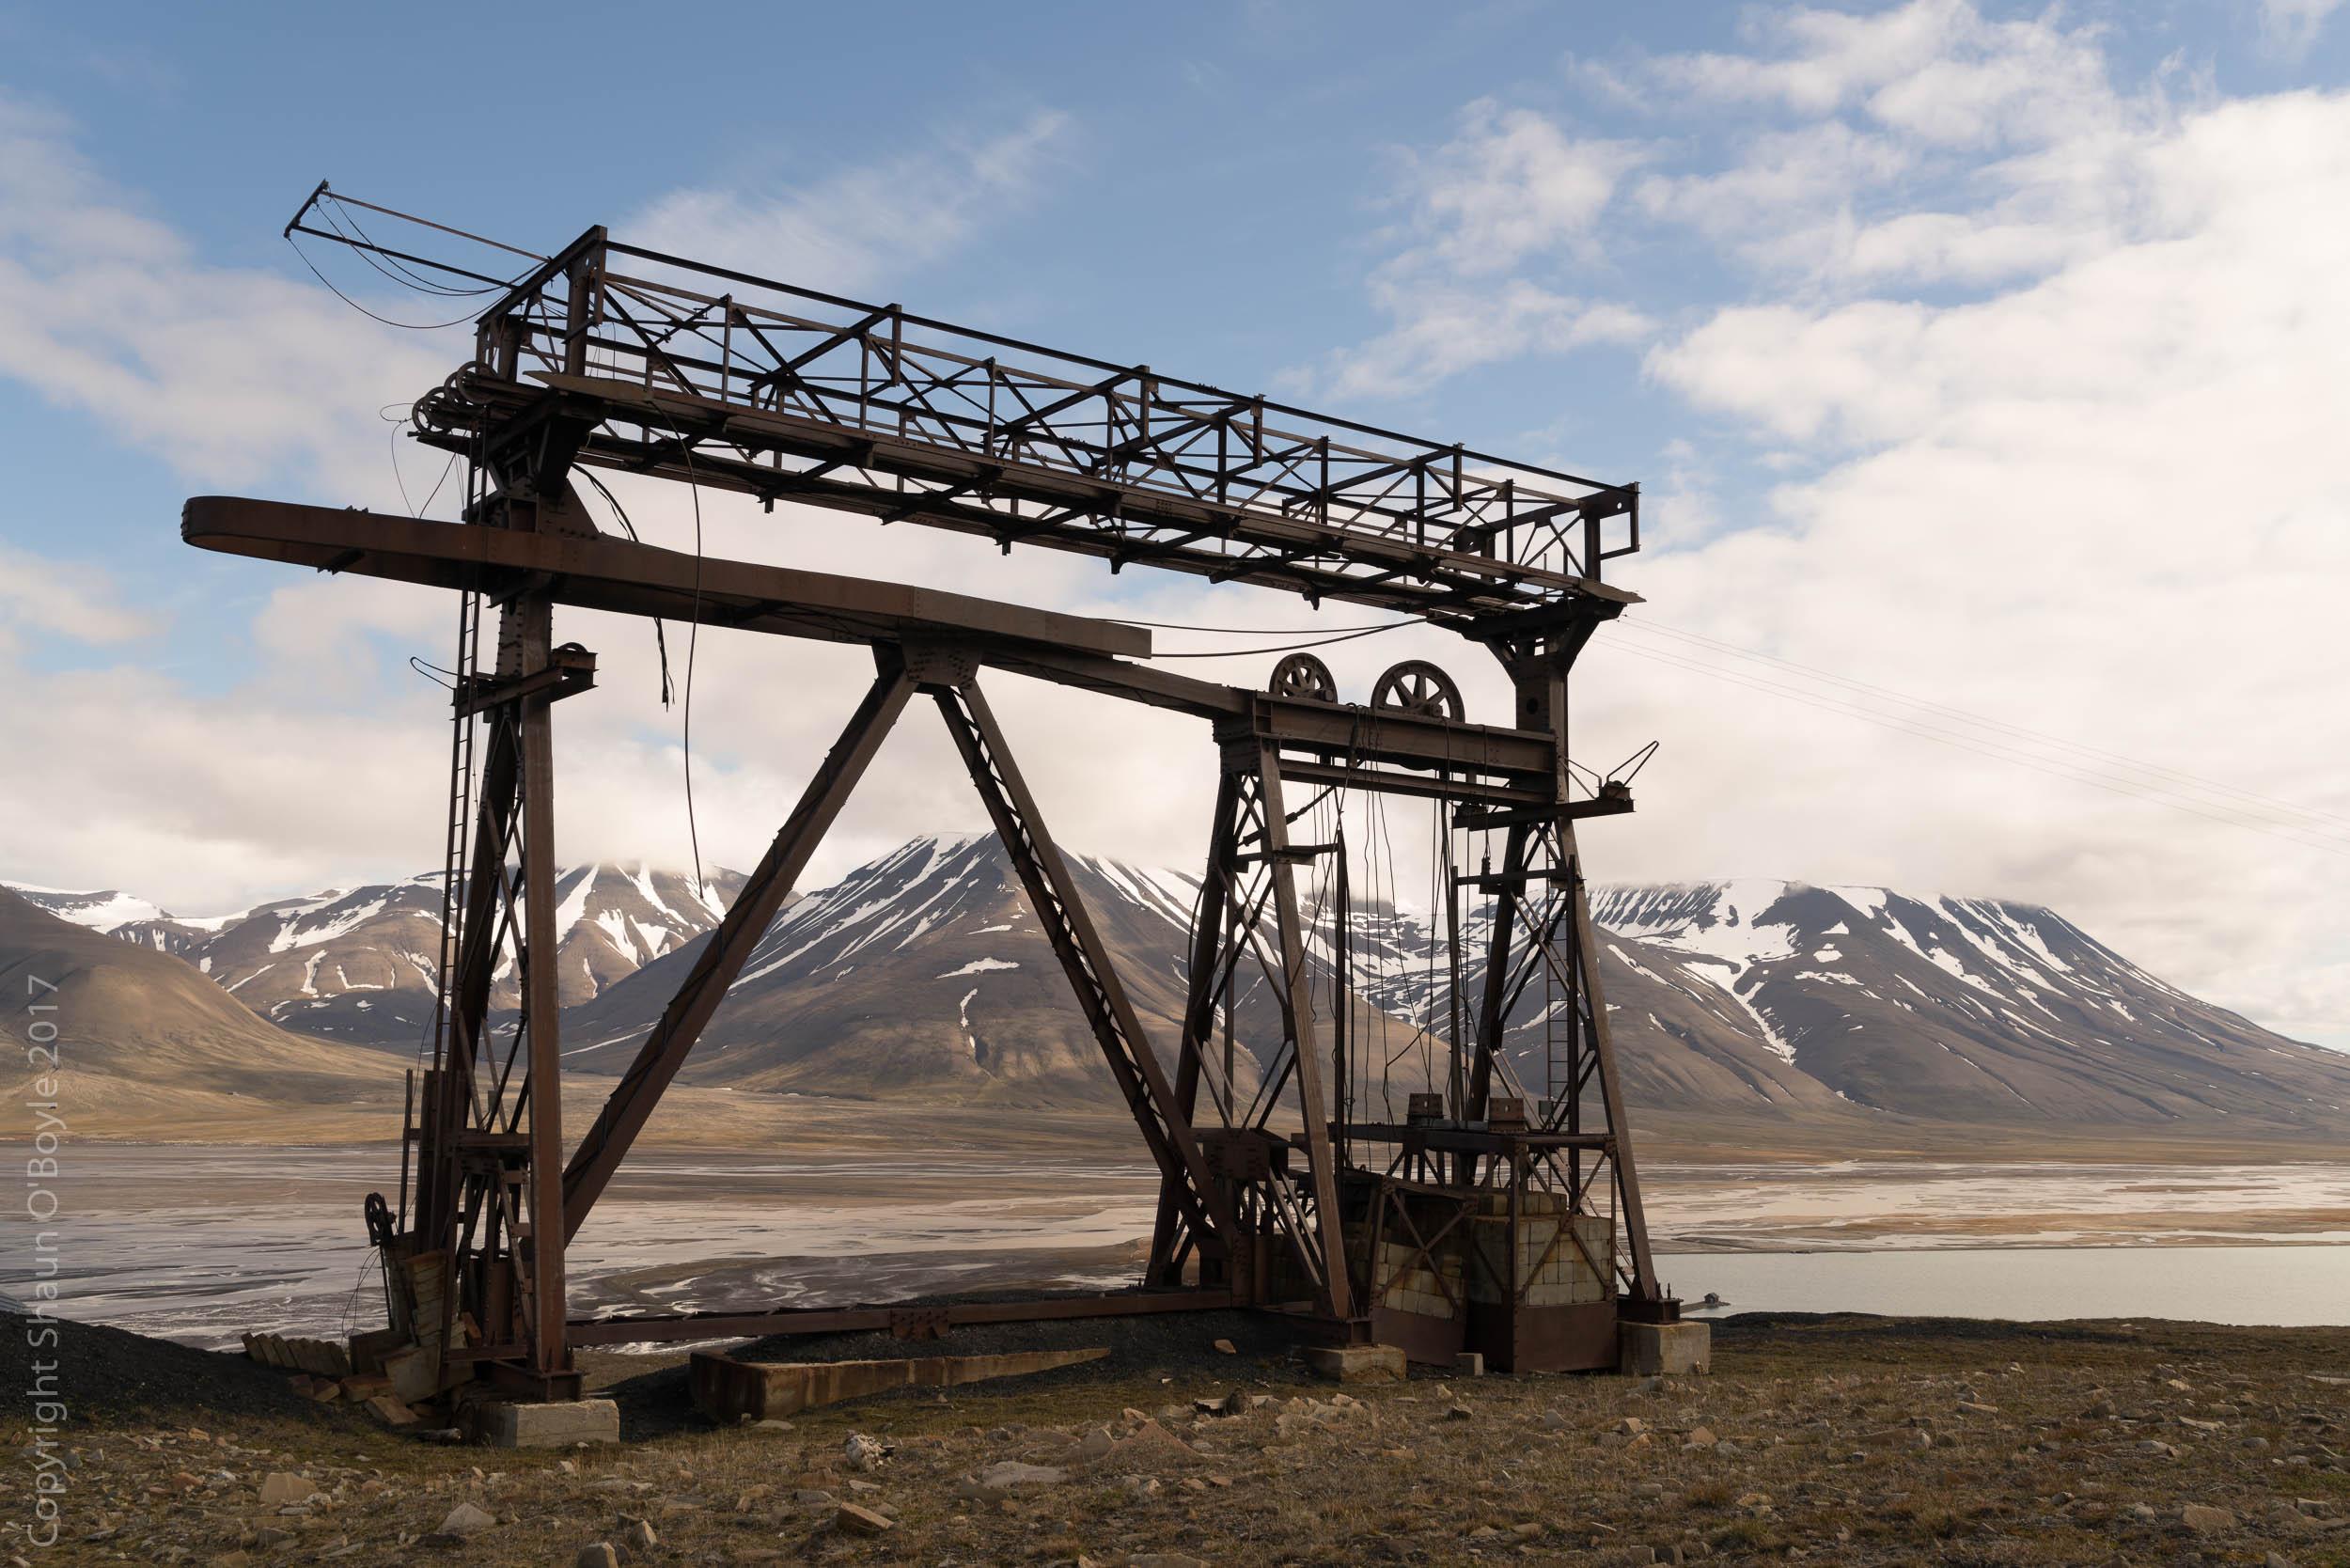 Cableway used to transport coal, Longyearbyen, Spitsbergen